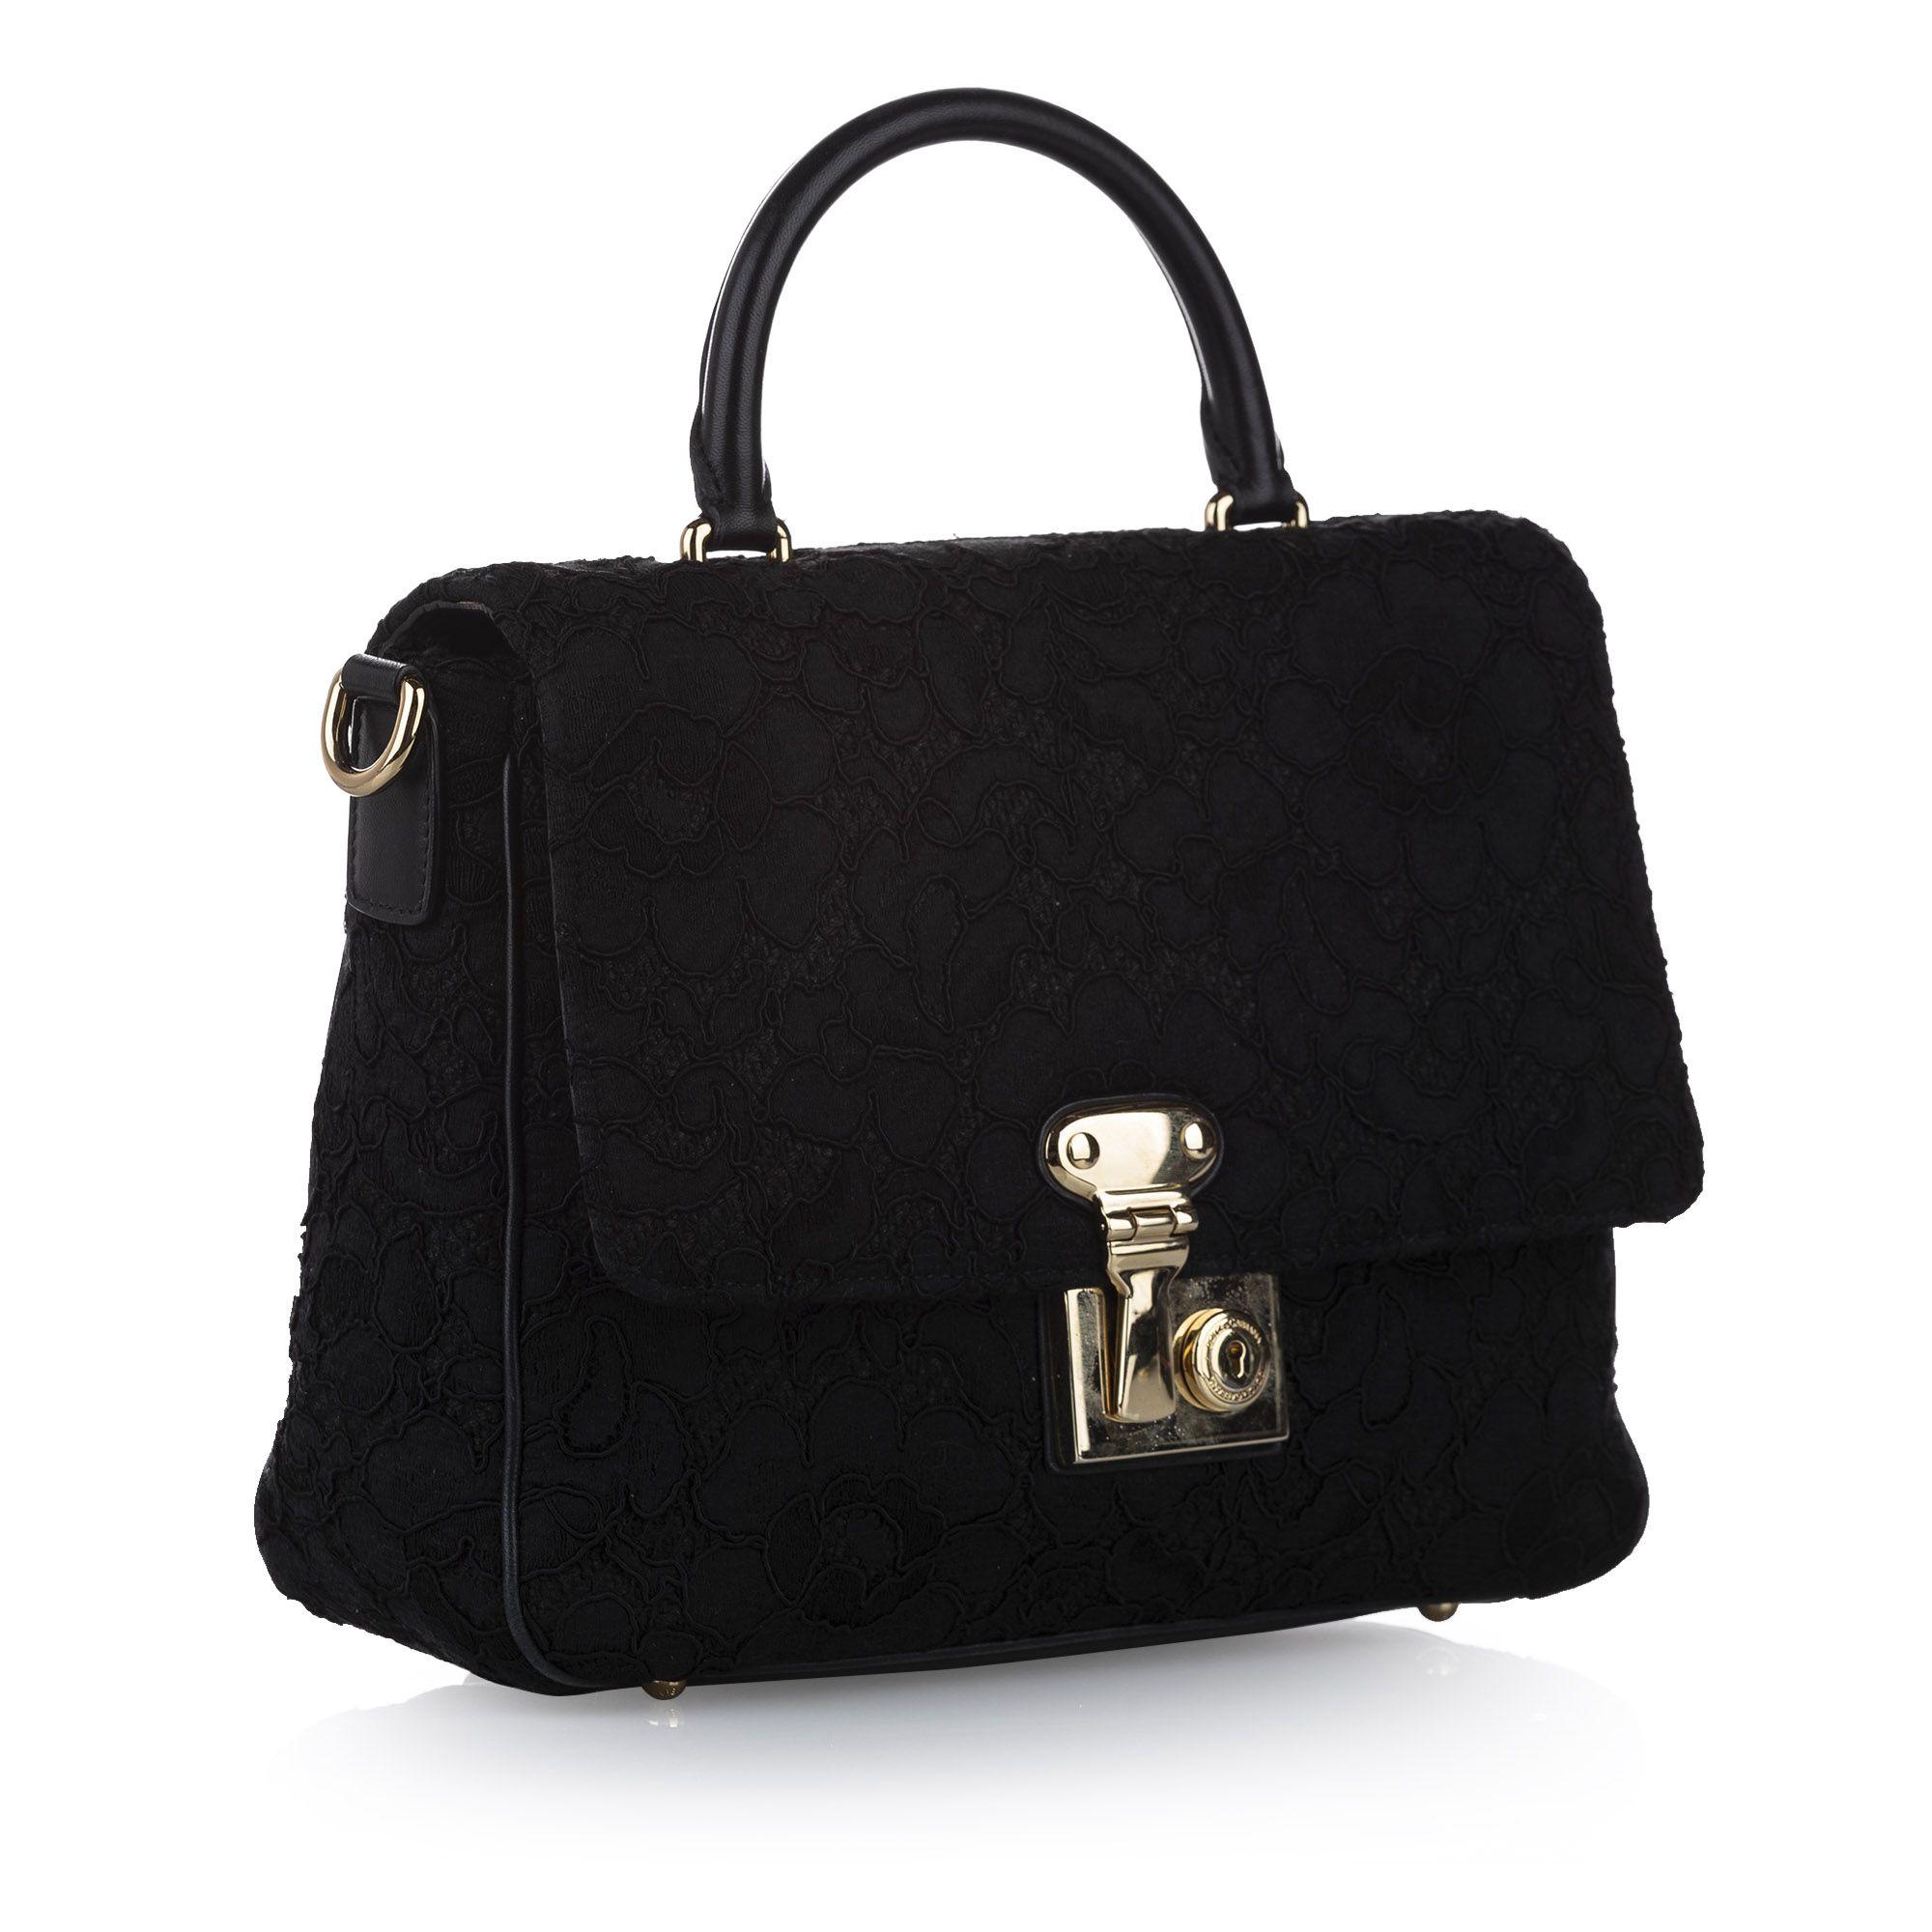 Vintage Dolce&Gabbana Tweed Satchel Black